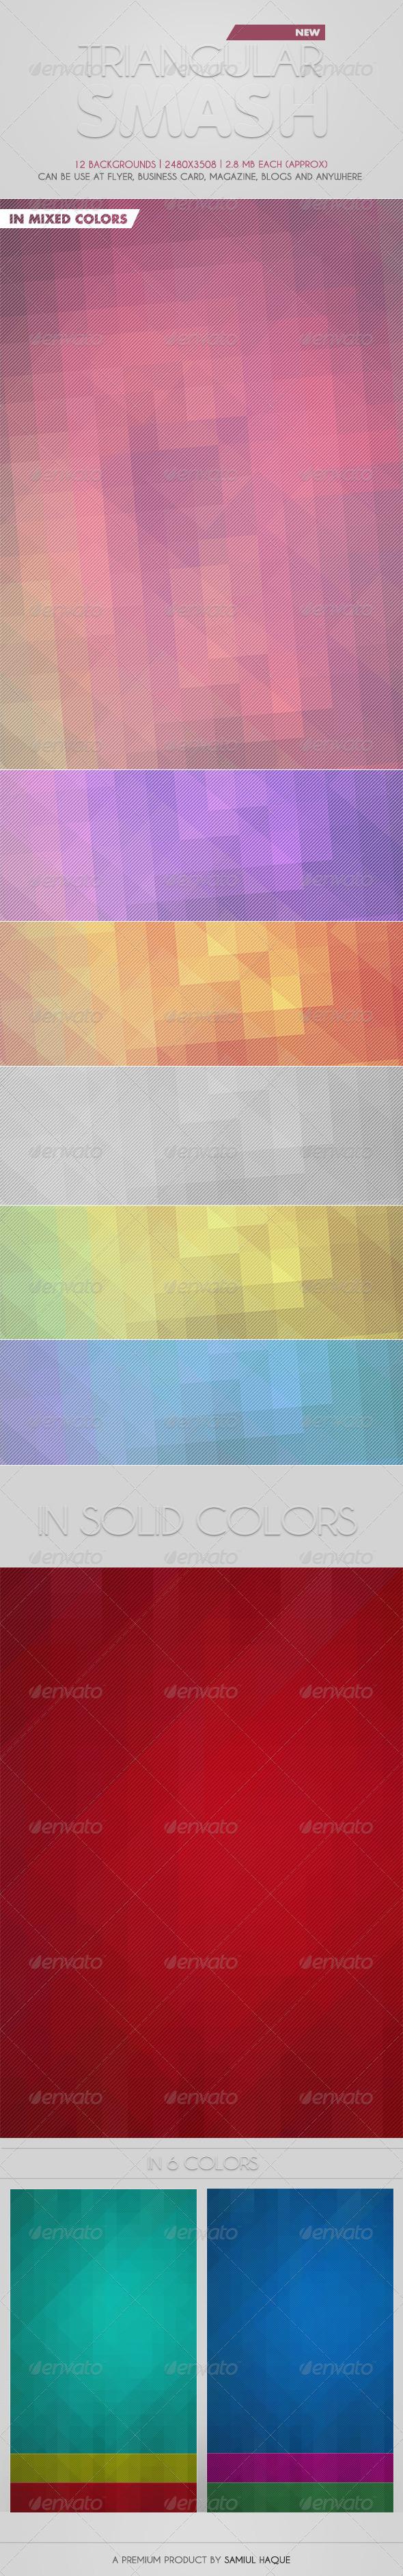 GraphicRiver Triangular Smash Background 4451731